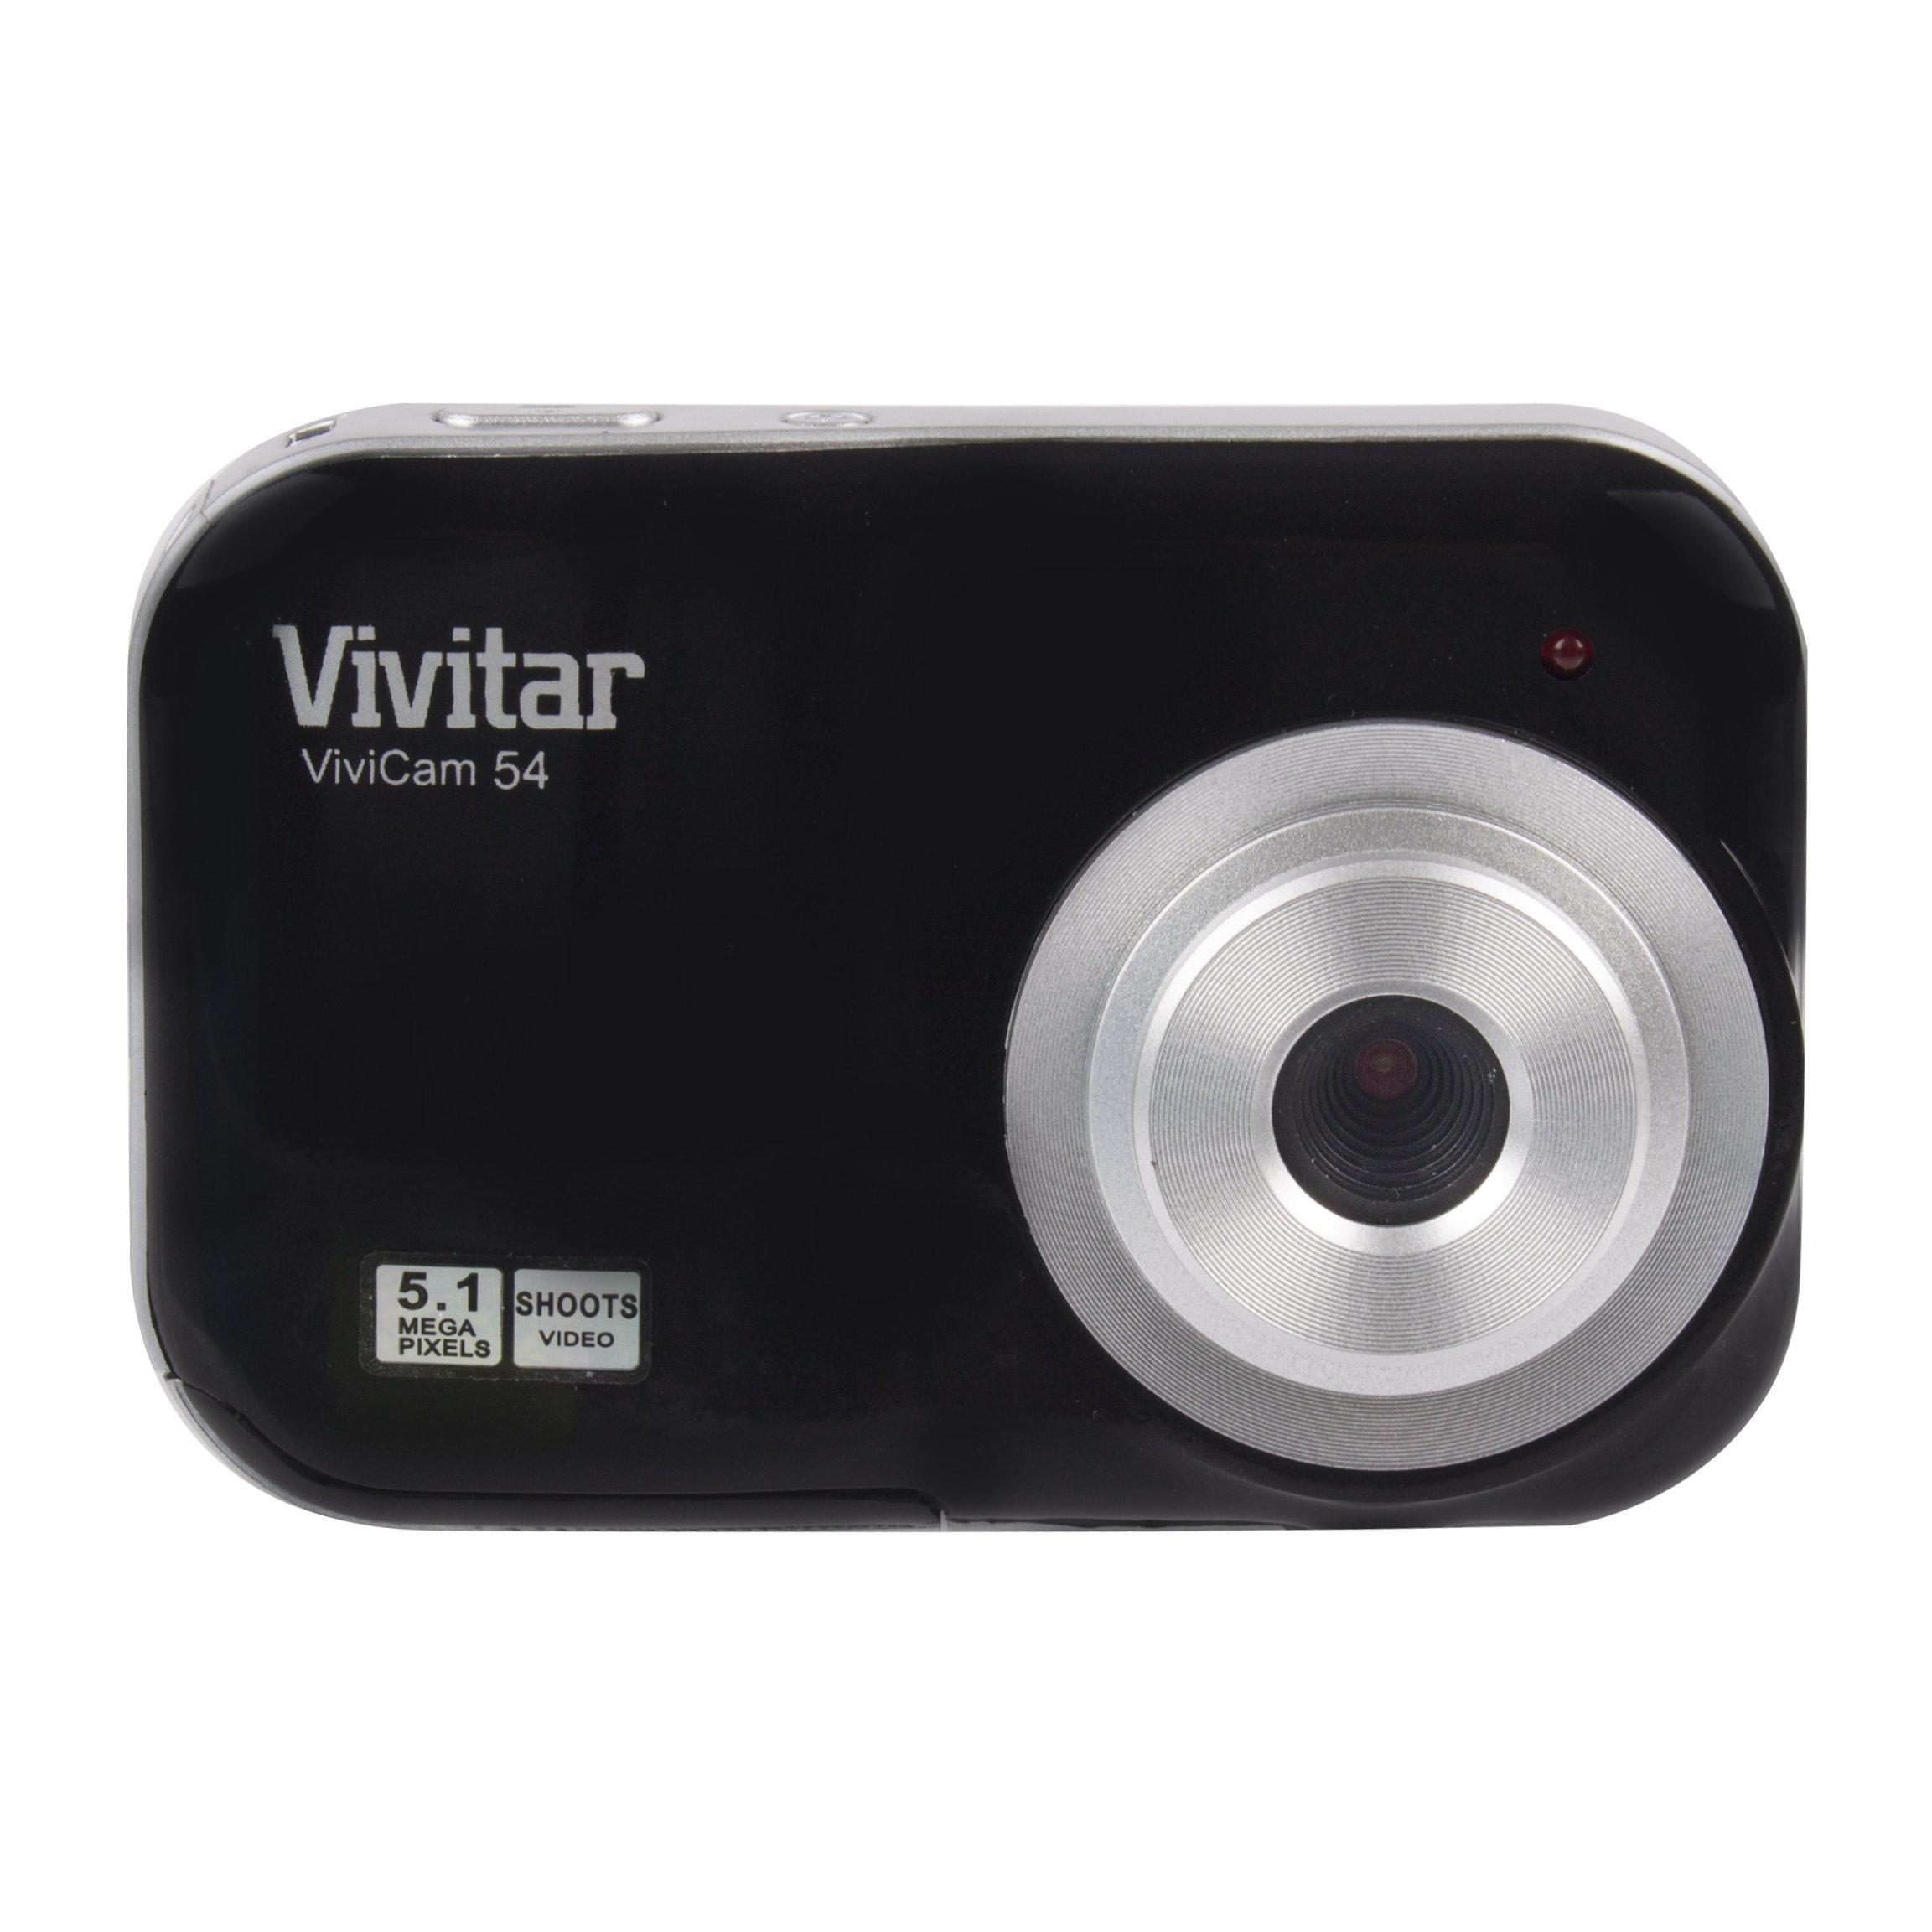 Vivitar V46-WHT 5.1MP Digital Camera with 1.8 tft, Colors May Vary